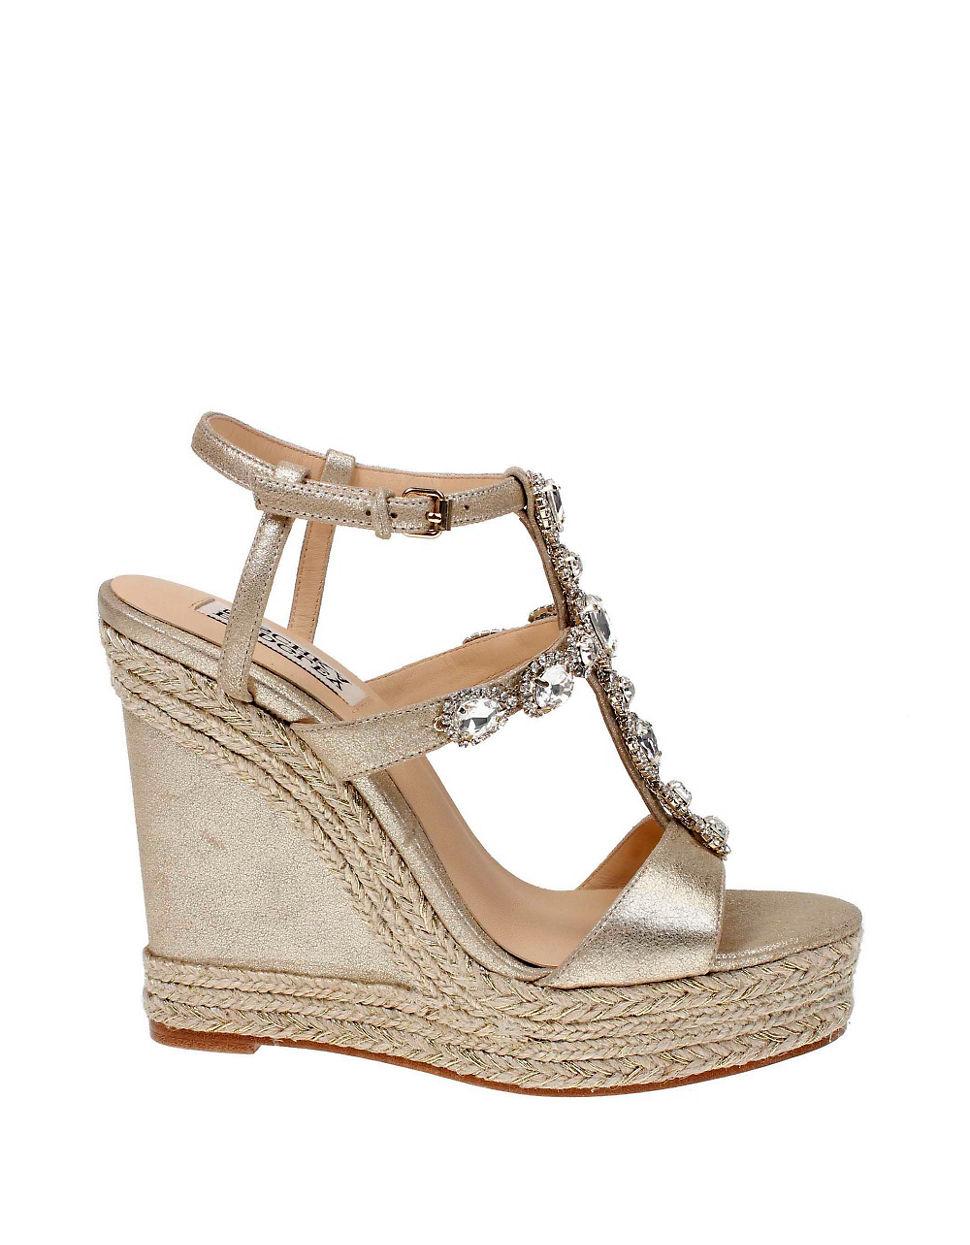 badgley mischka coco metallic leather wedge sandals in